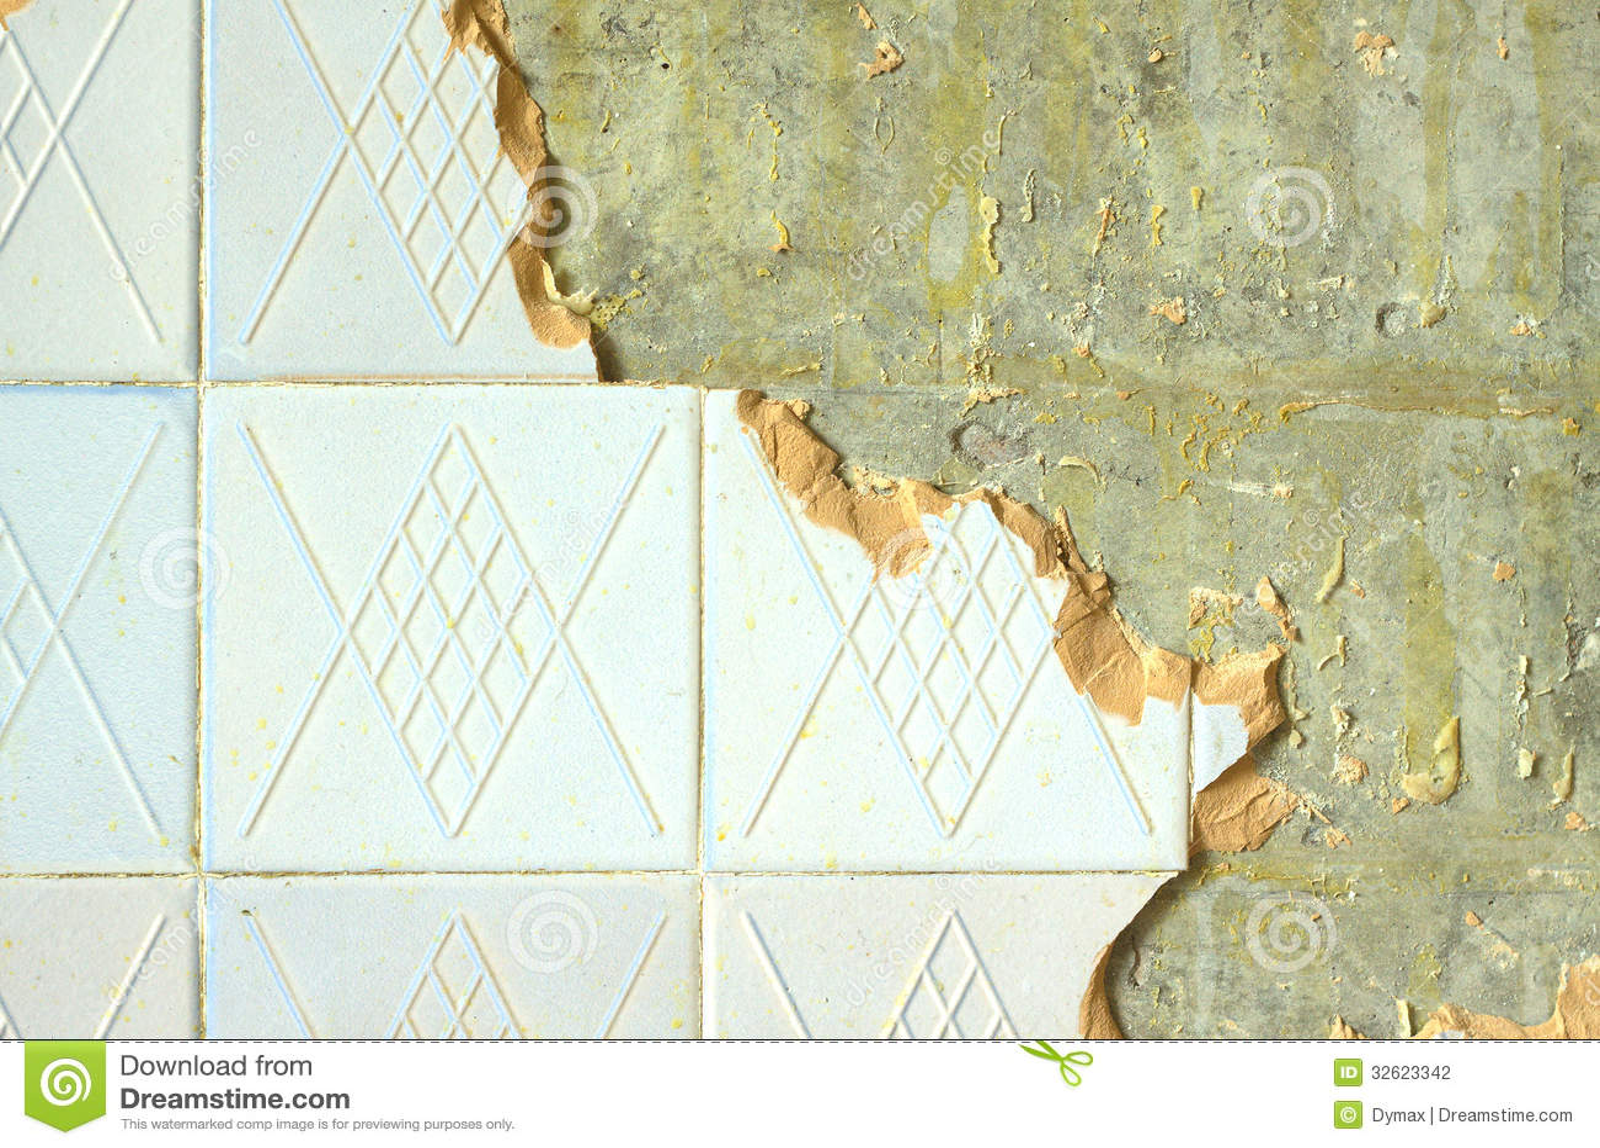 Ceramic Tiling On Repairing Room Wall Stock Photo Image Of Closeup